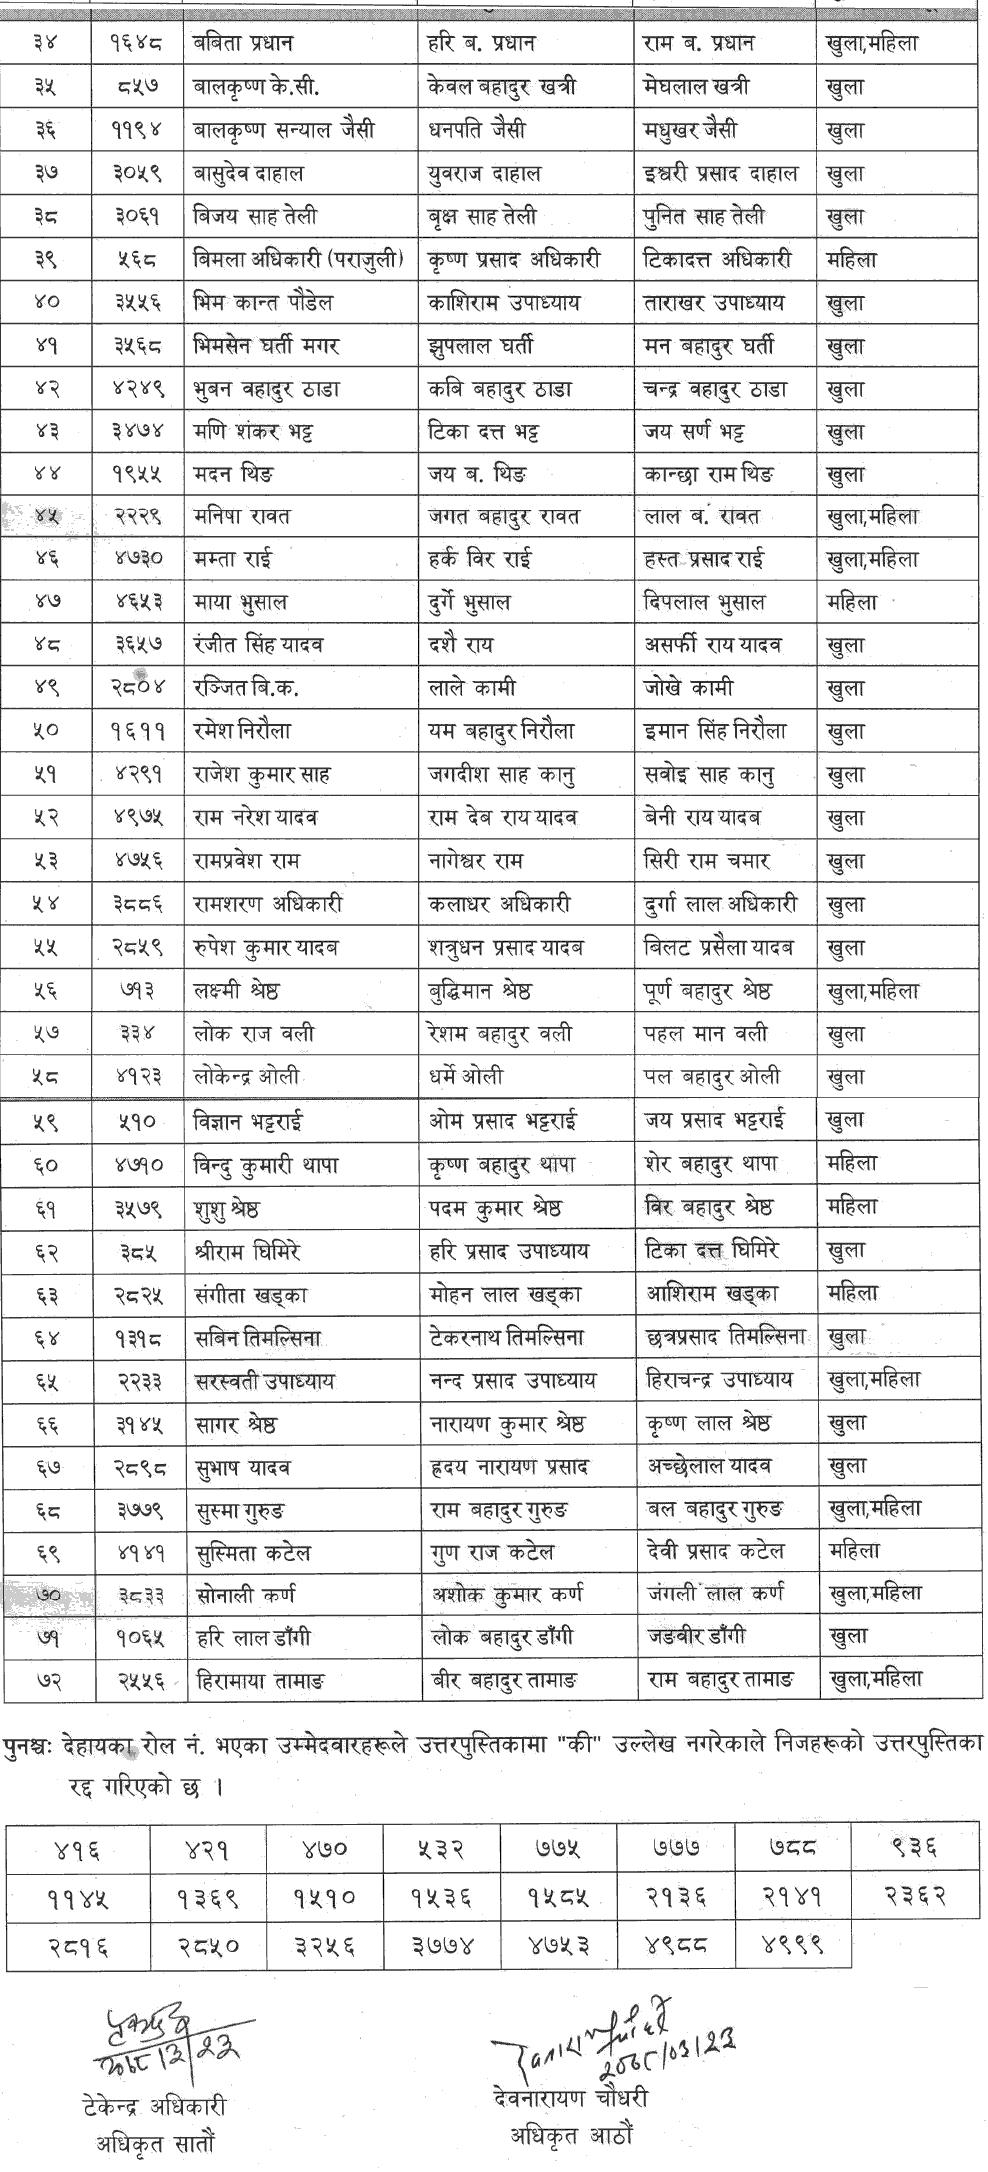 Written Exam Result of Bagmati Pradesh Lok Sewa Aayog